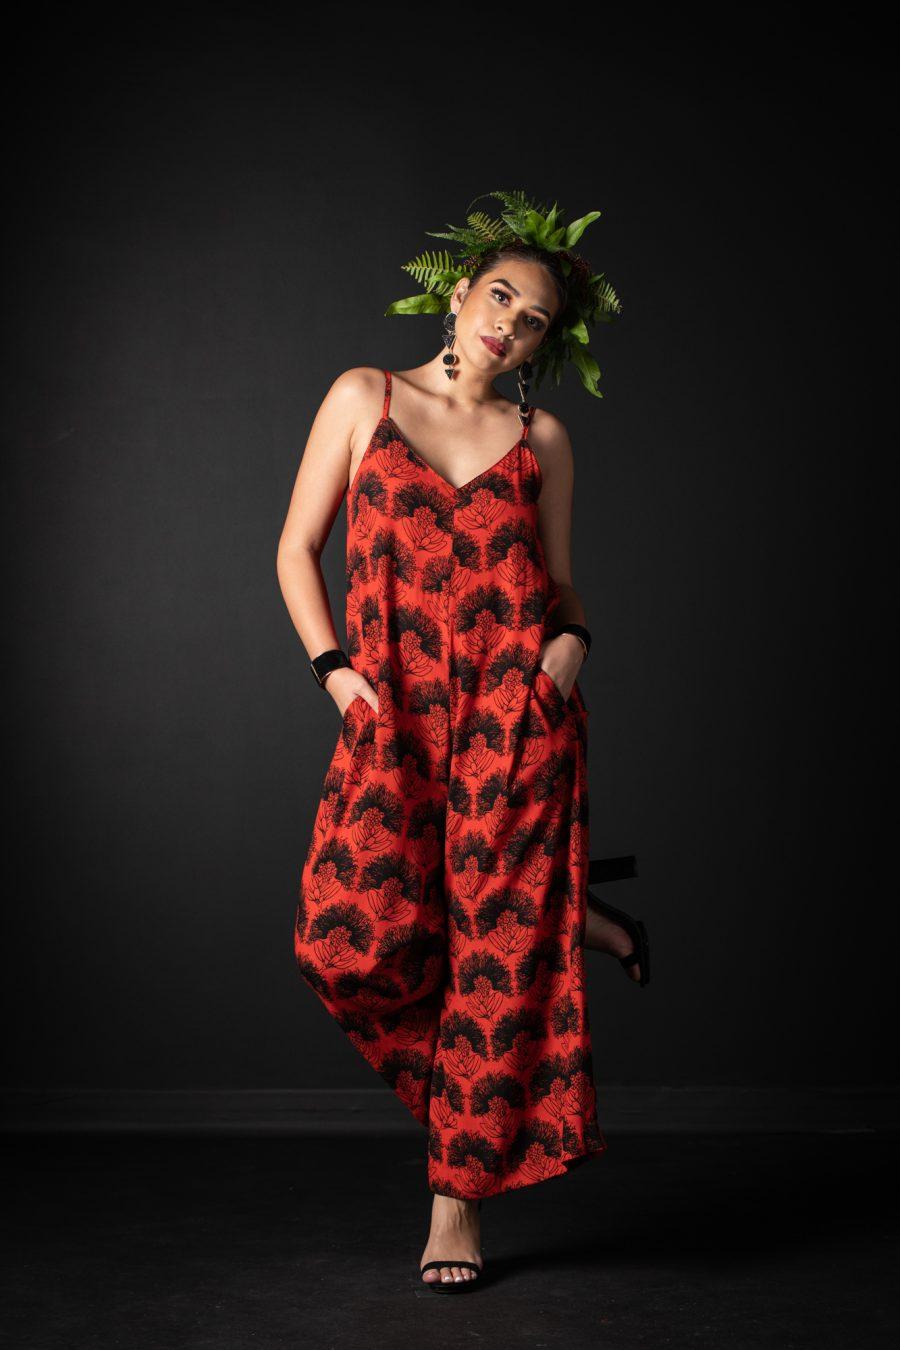 Model wearing LANIHAU JUMPSUIT in Firey Red Black Kalihilehua Pattern - Front View